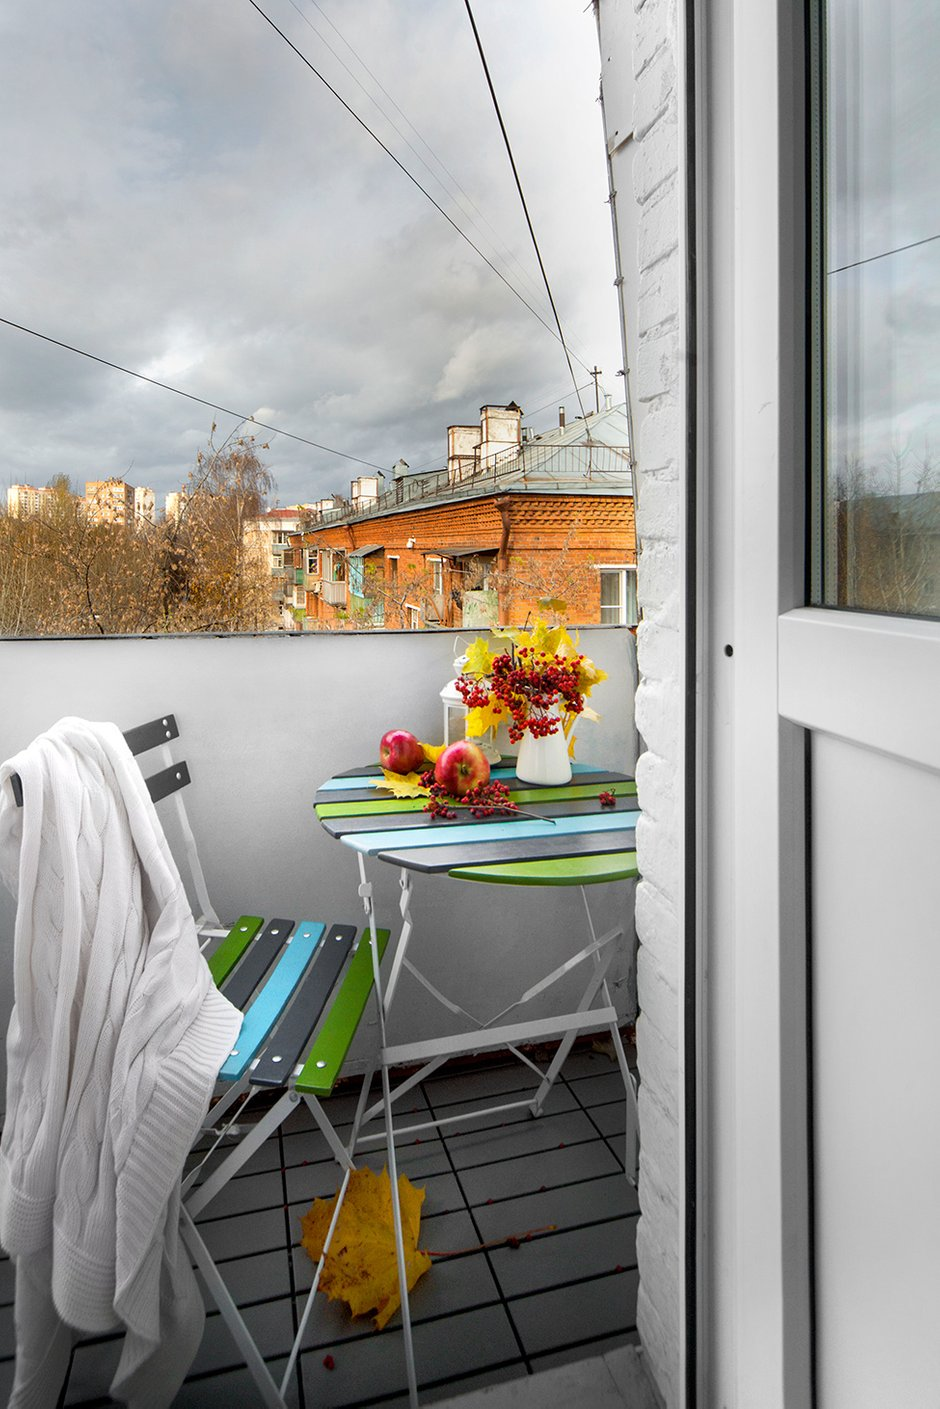 Фотография: Балкон, Терраса в стиле Современный, Малогабаритная квартира, Квартира, Дома и квартиры, IKEA, Проект недели, Максим Тихонов, Ольга Мелекесцева, Хрущевка, 1 комната, до 40 метров – фото на INMYROOM